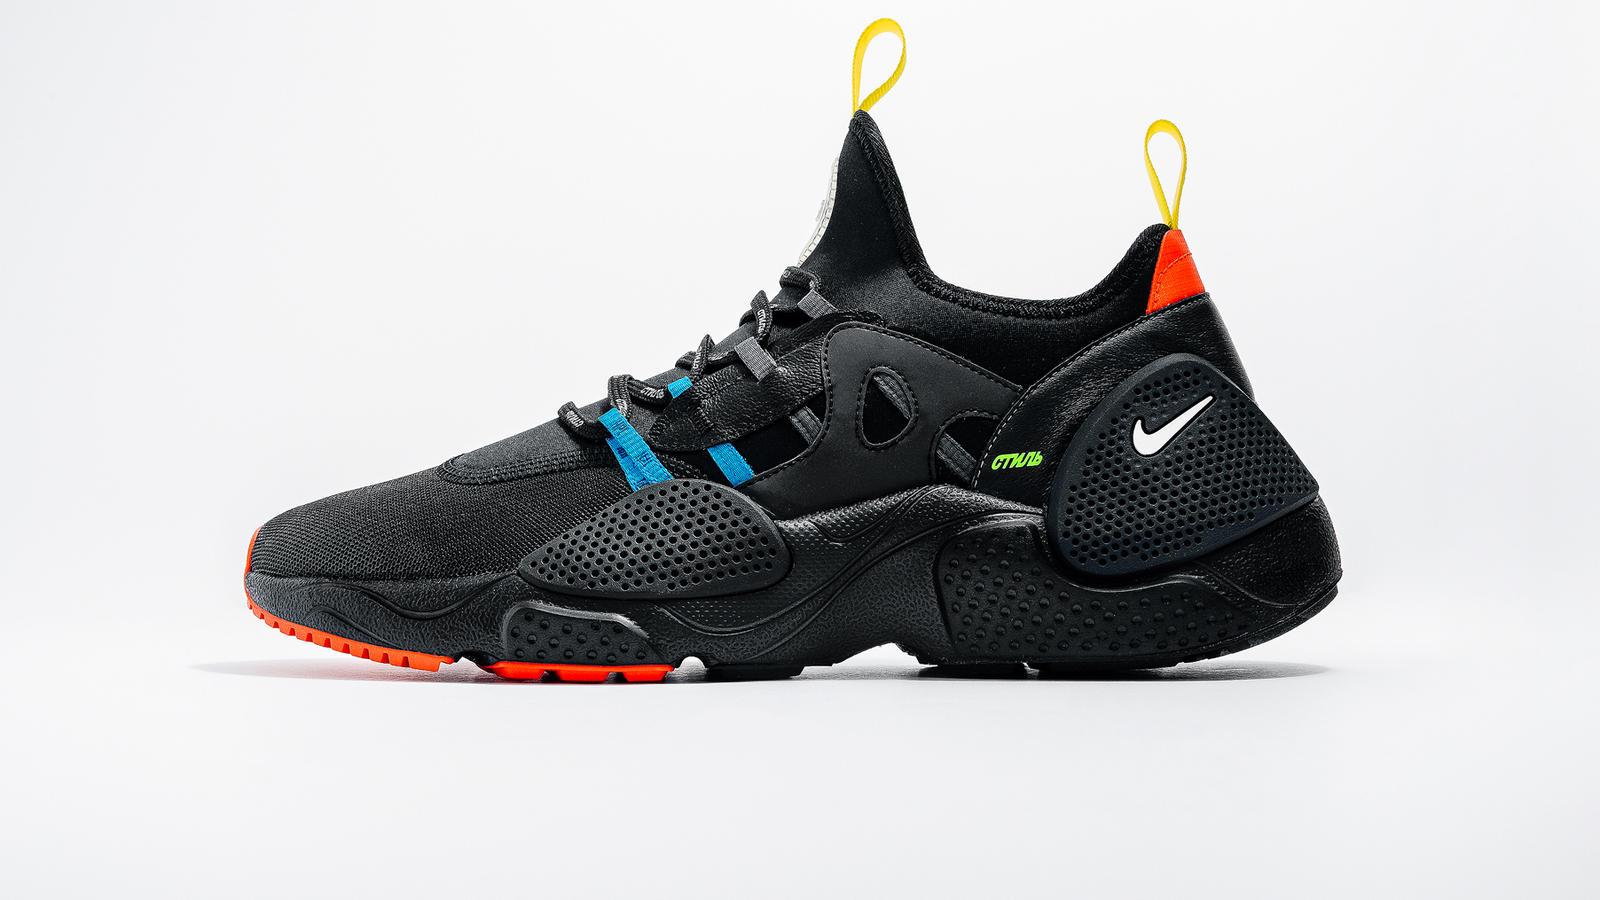 Nike x Heron Preston Huarache E.D.G.E. 0